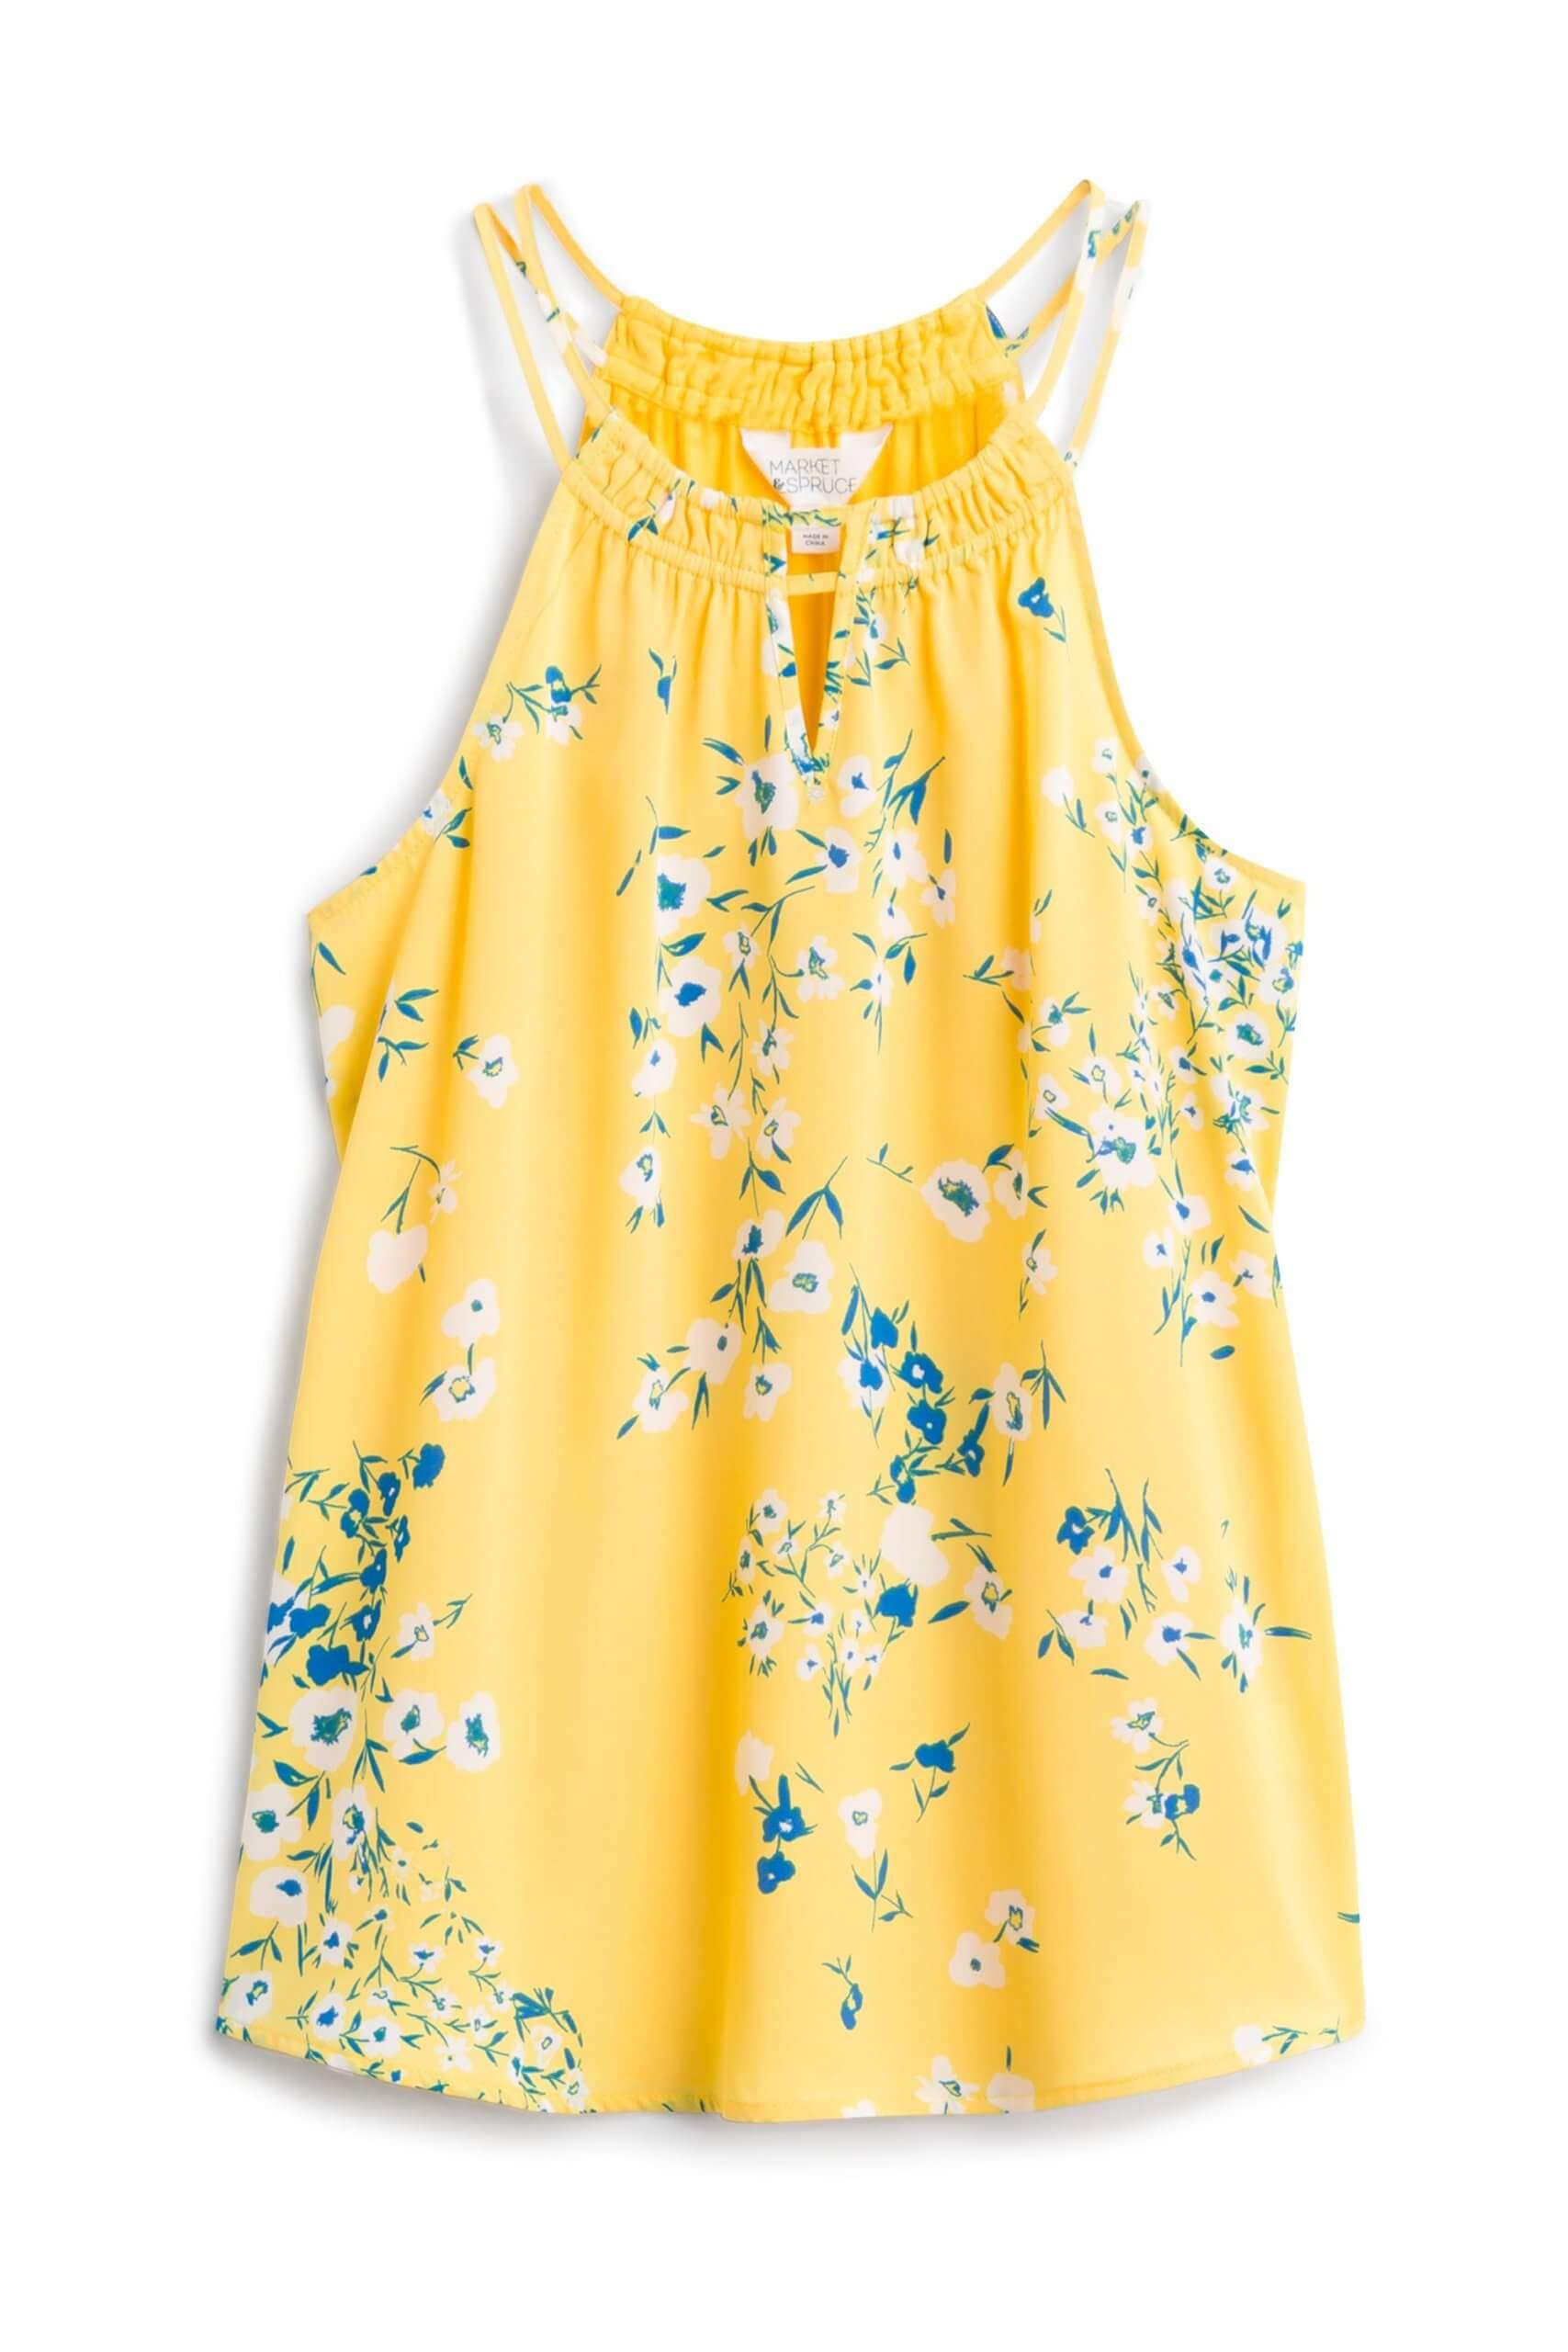 Stitch Fix Women's yellow floral halter tank top.